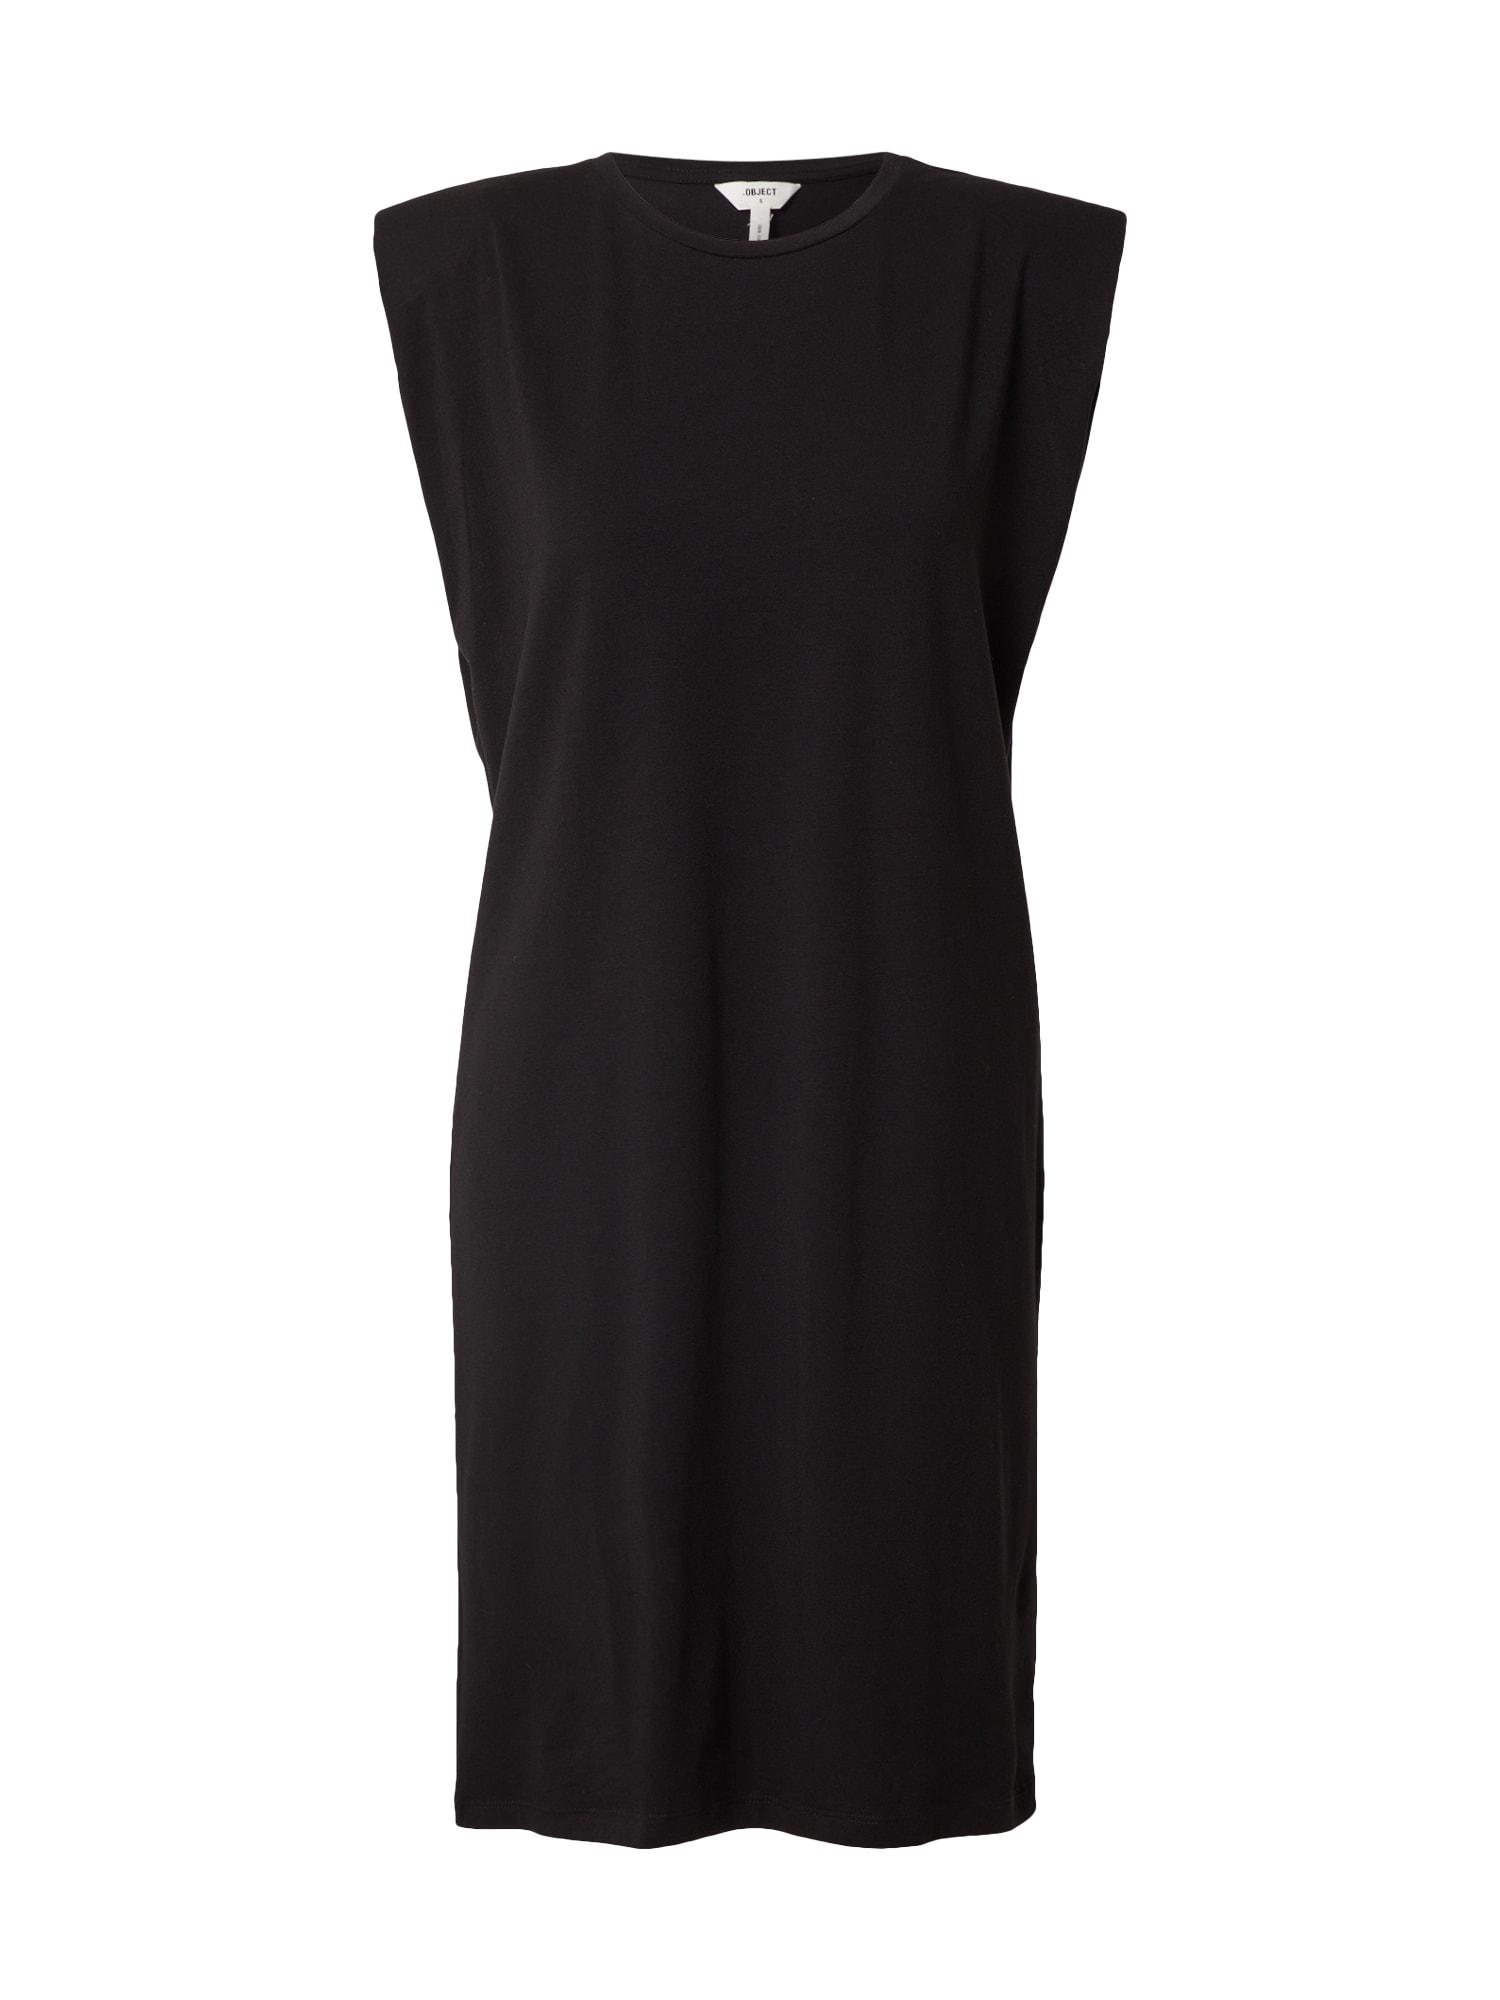 OBJECT Tall Suknelė